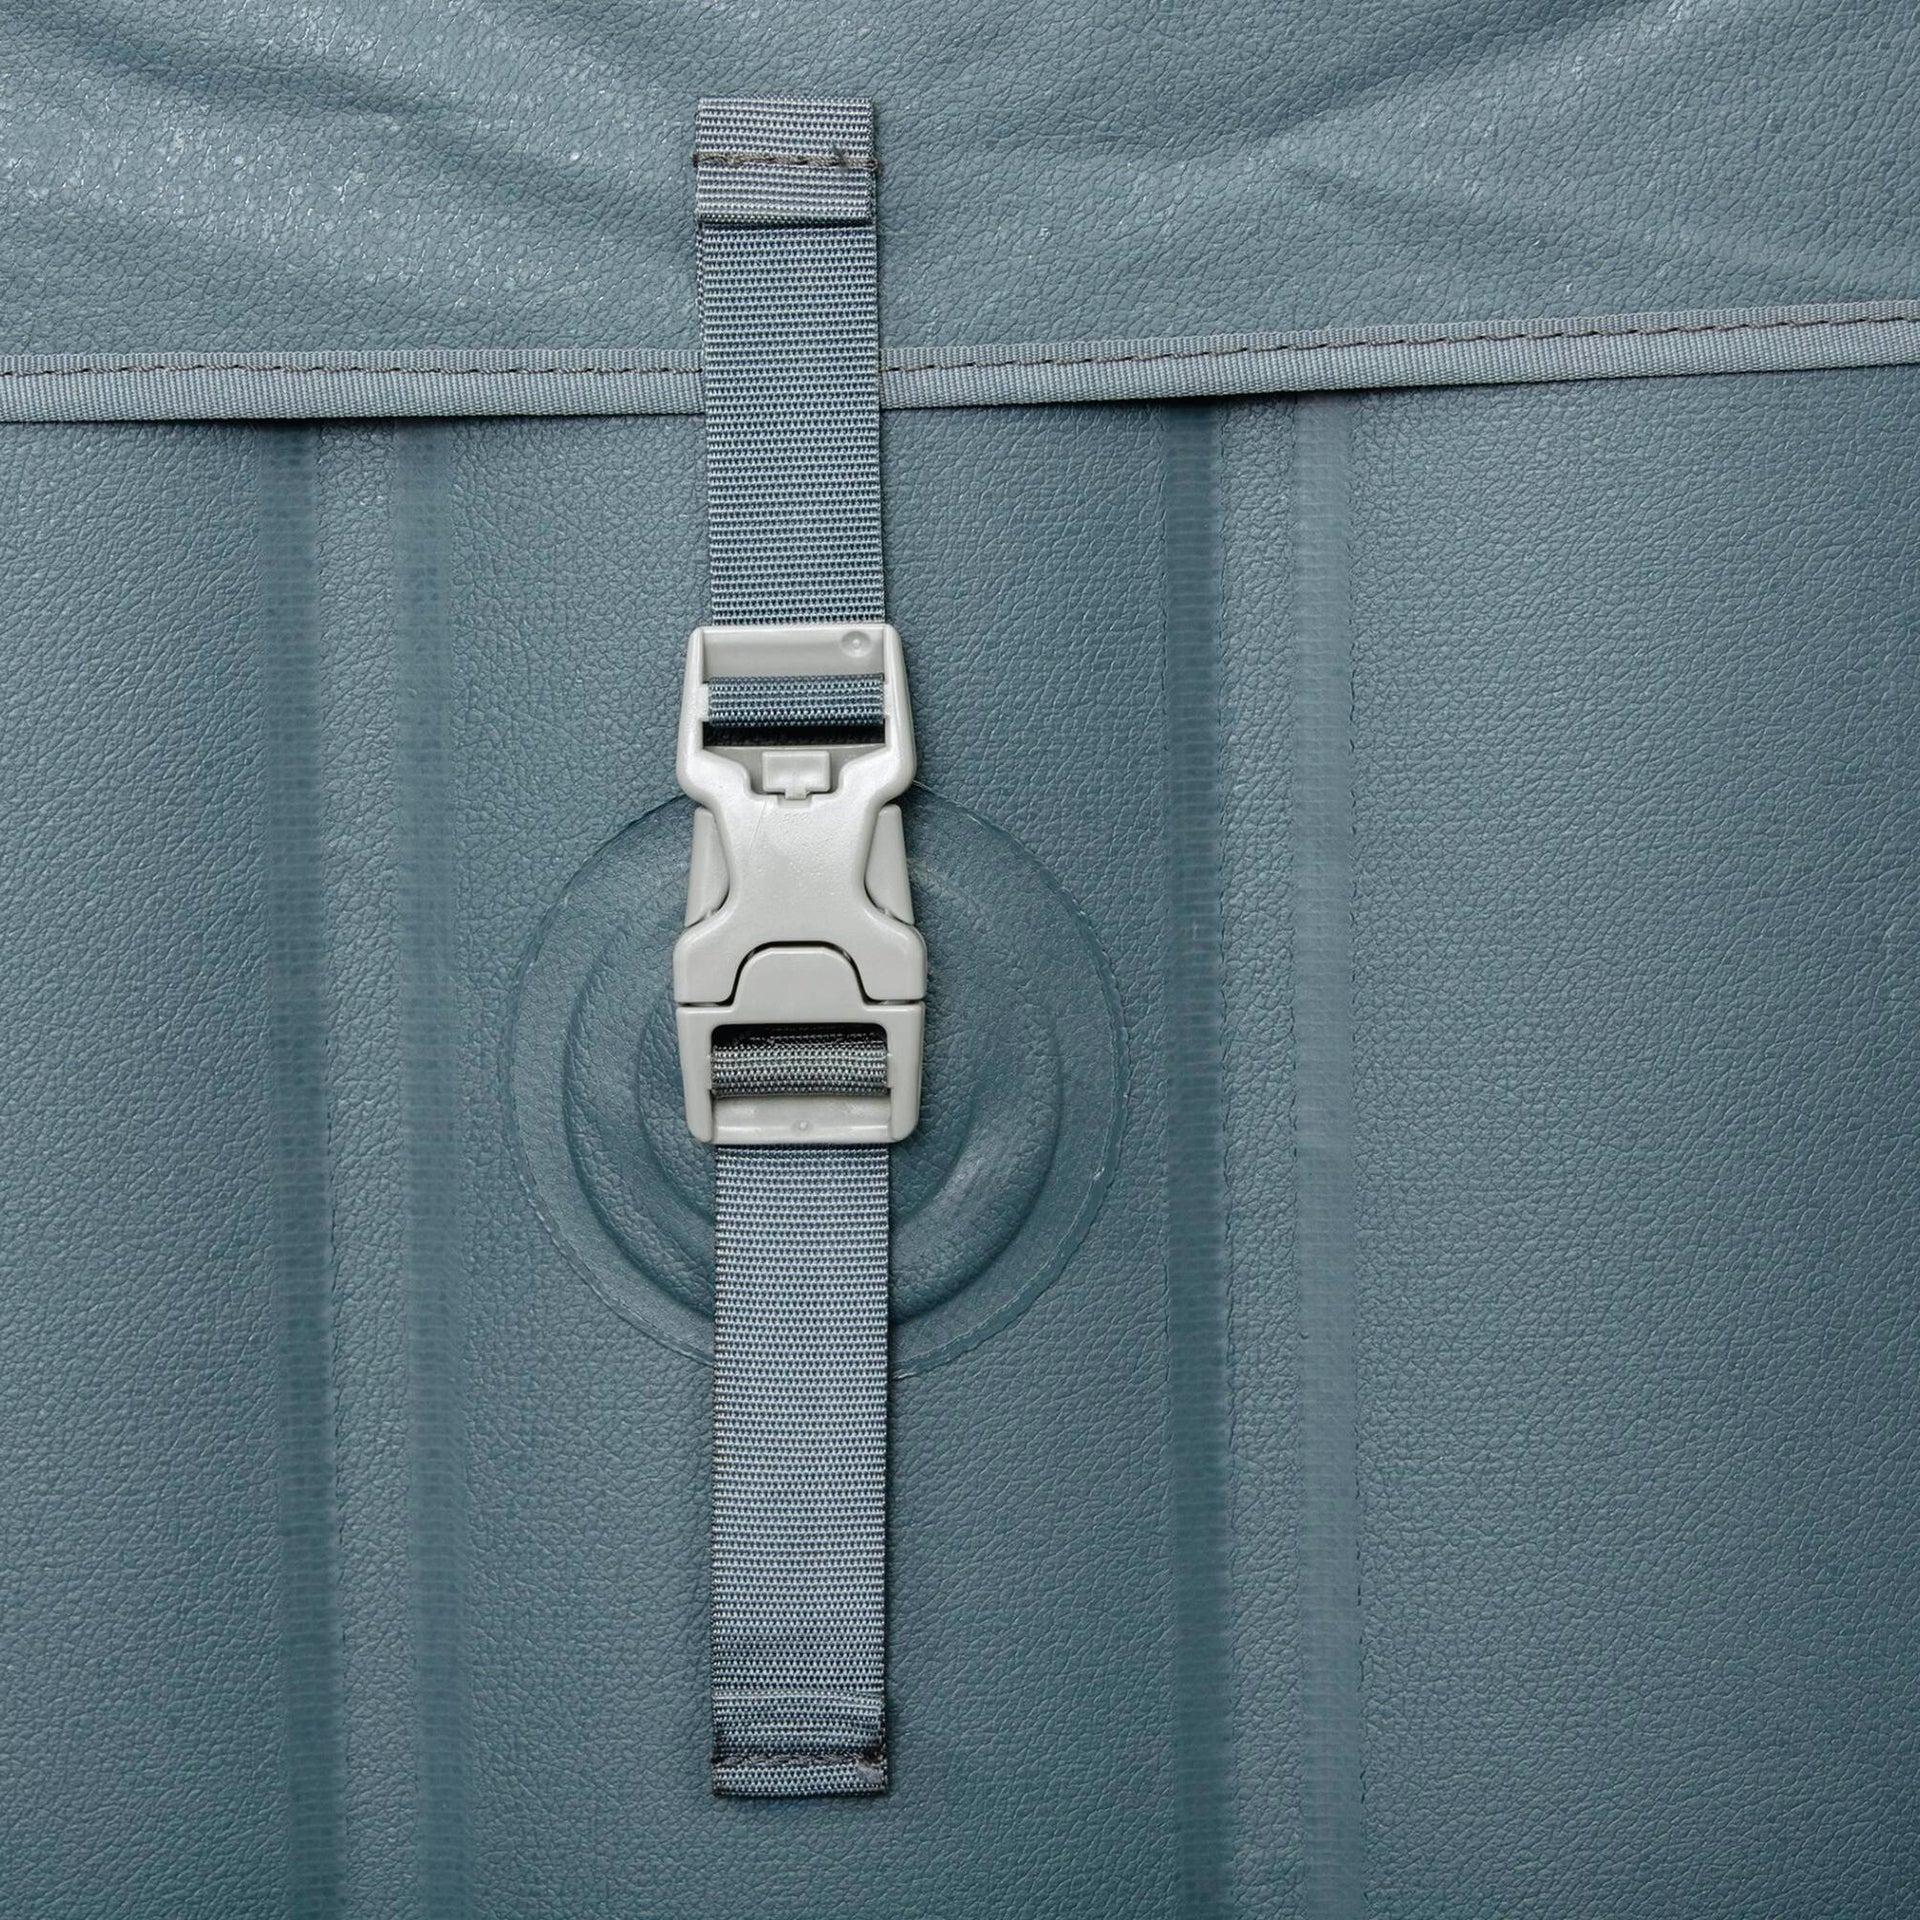 Piscina idromassaggio da esterno gonfiabile BESTWAY LAY-Z-SPA HAWAII HYDROJET PRO 180 x 180 cm - 7